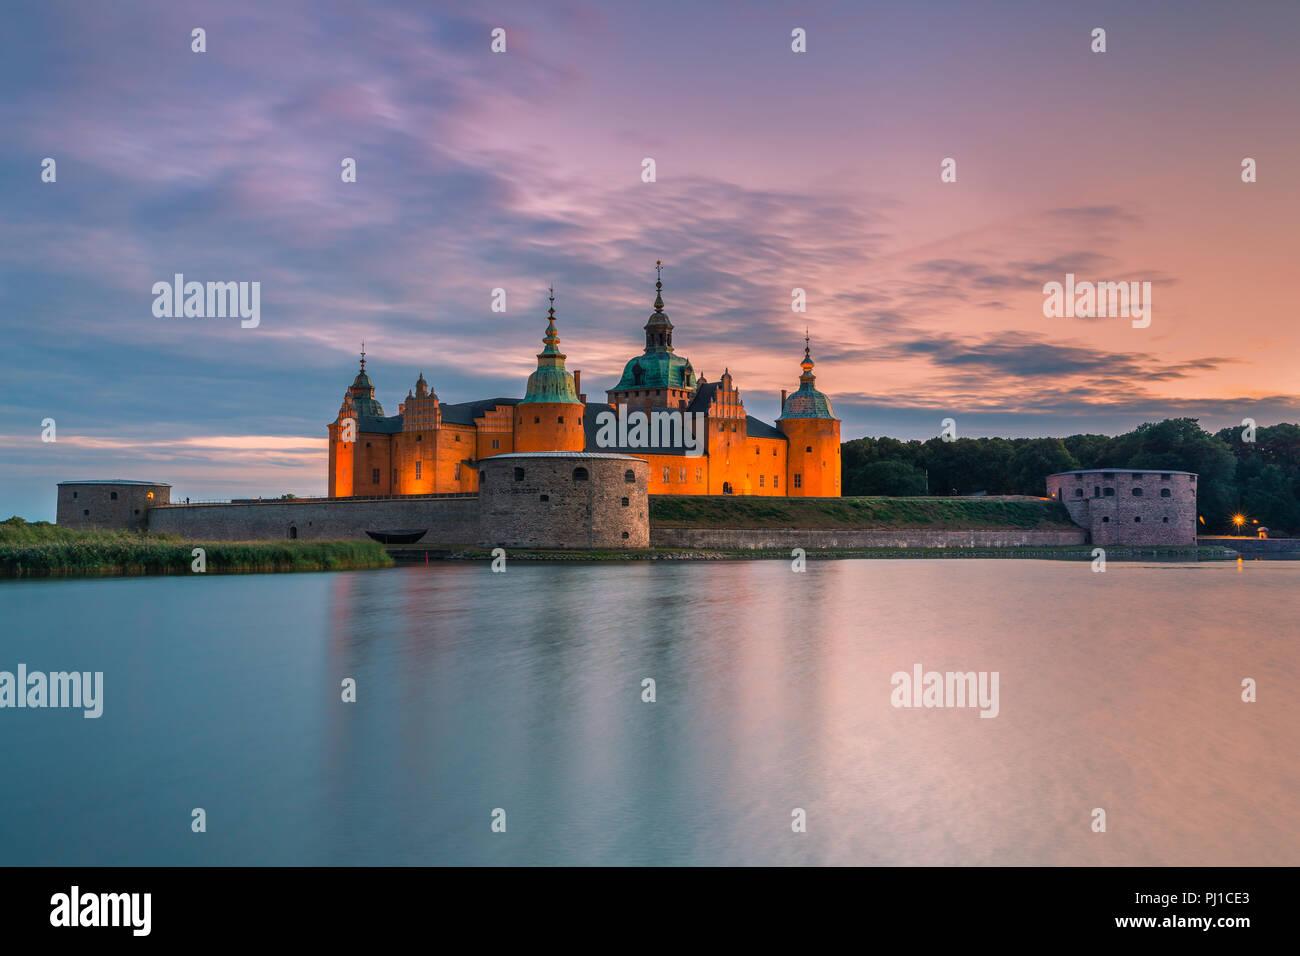 Kalmar Castle (Swedish: Kalmar slott) is a castle in the city Kalmar in the province of Smaland in Sweden. - Stock Image